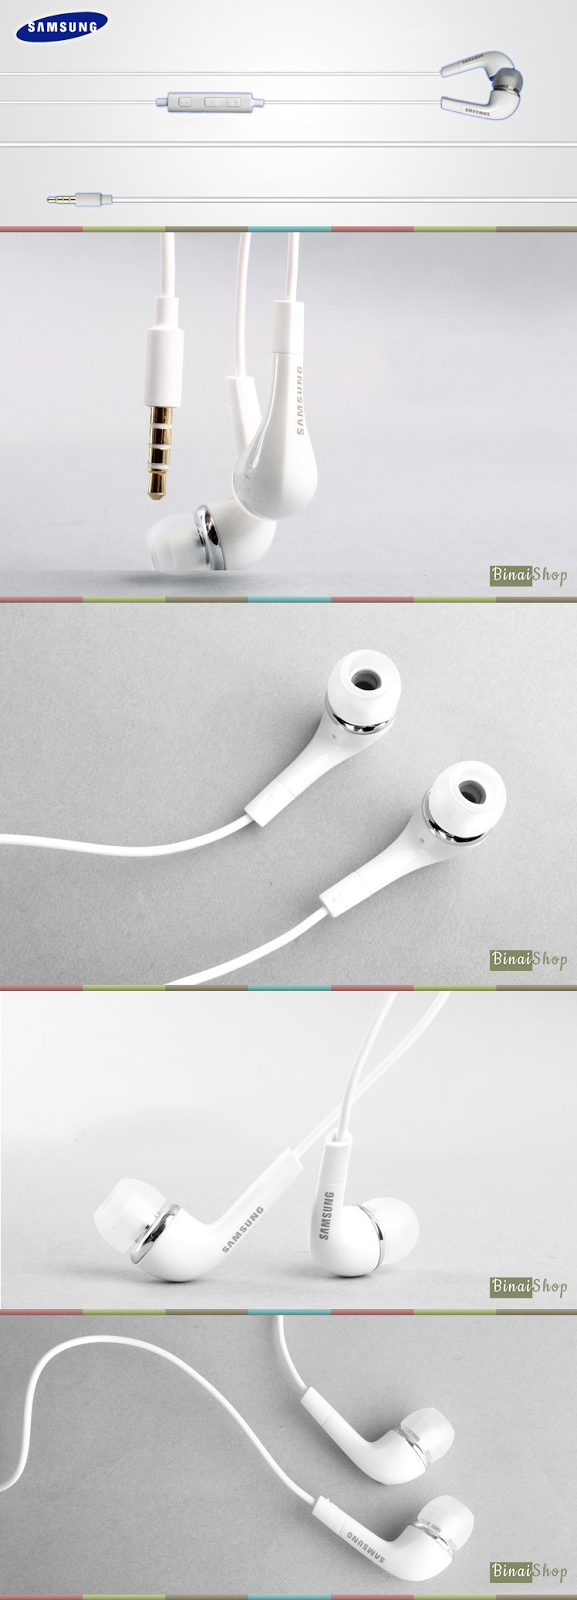 tai-nghe-samsung-i9300-binaishop.com 2